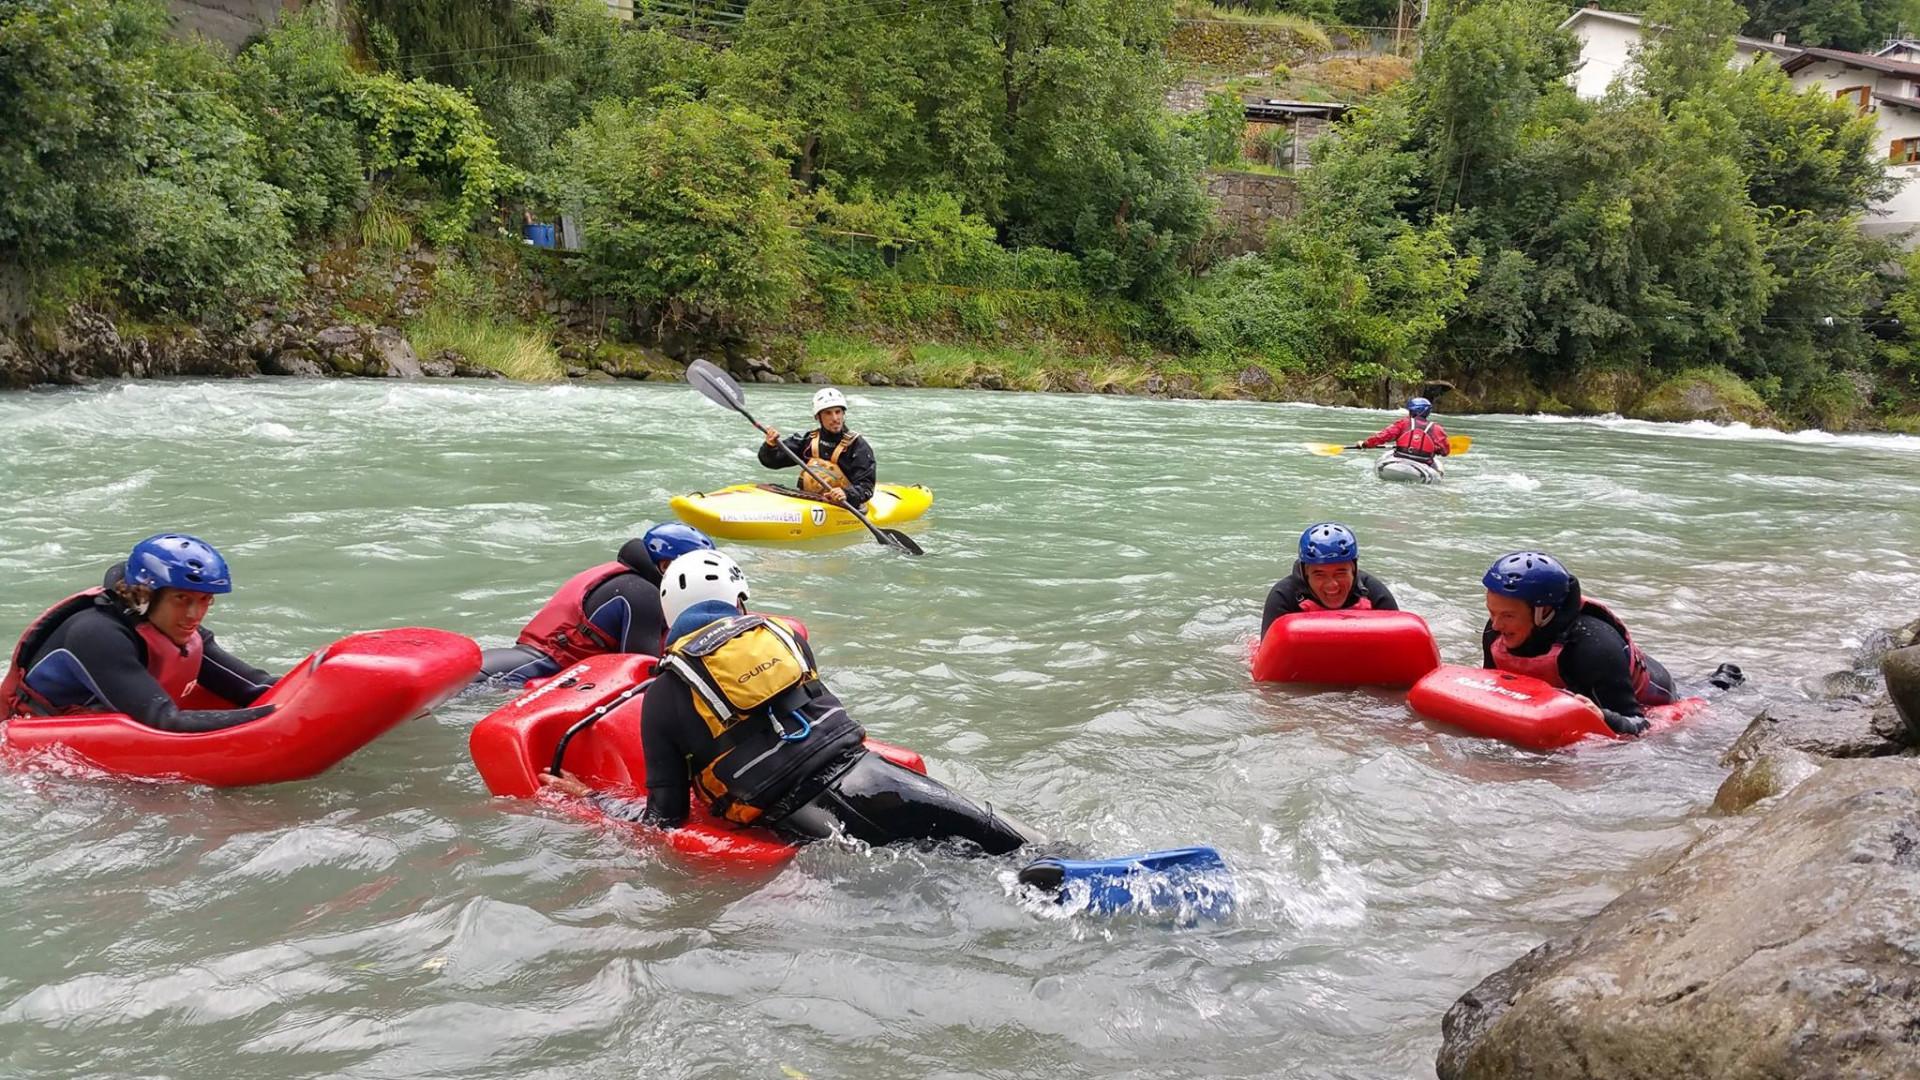 Hydrospeed Adrenaline in Valtellina